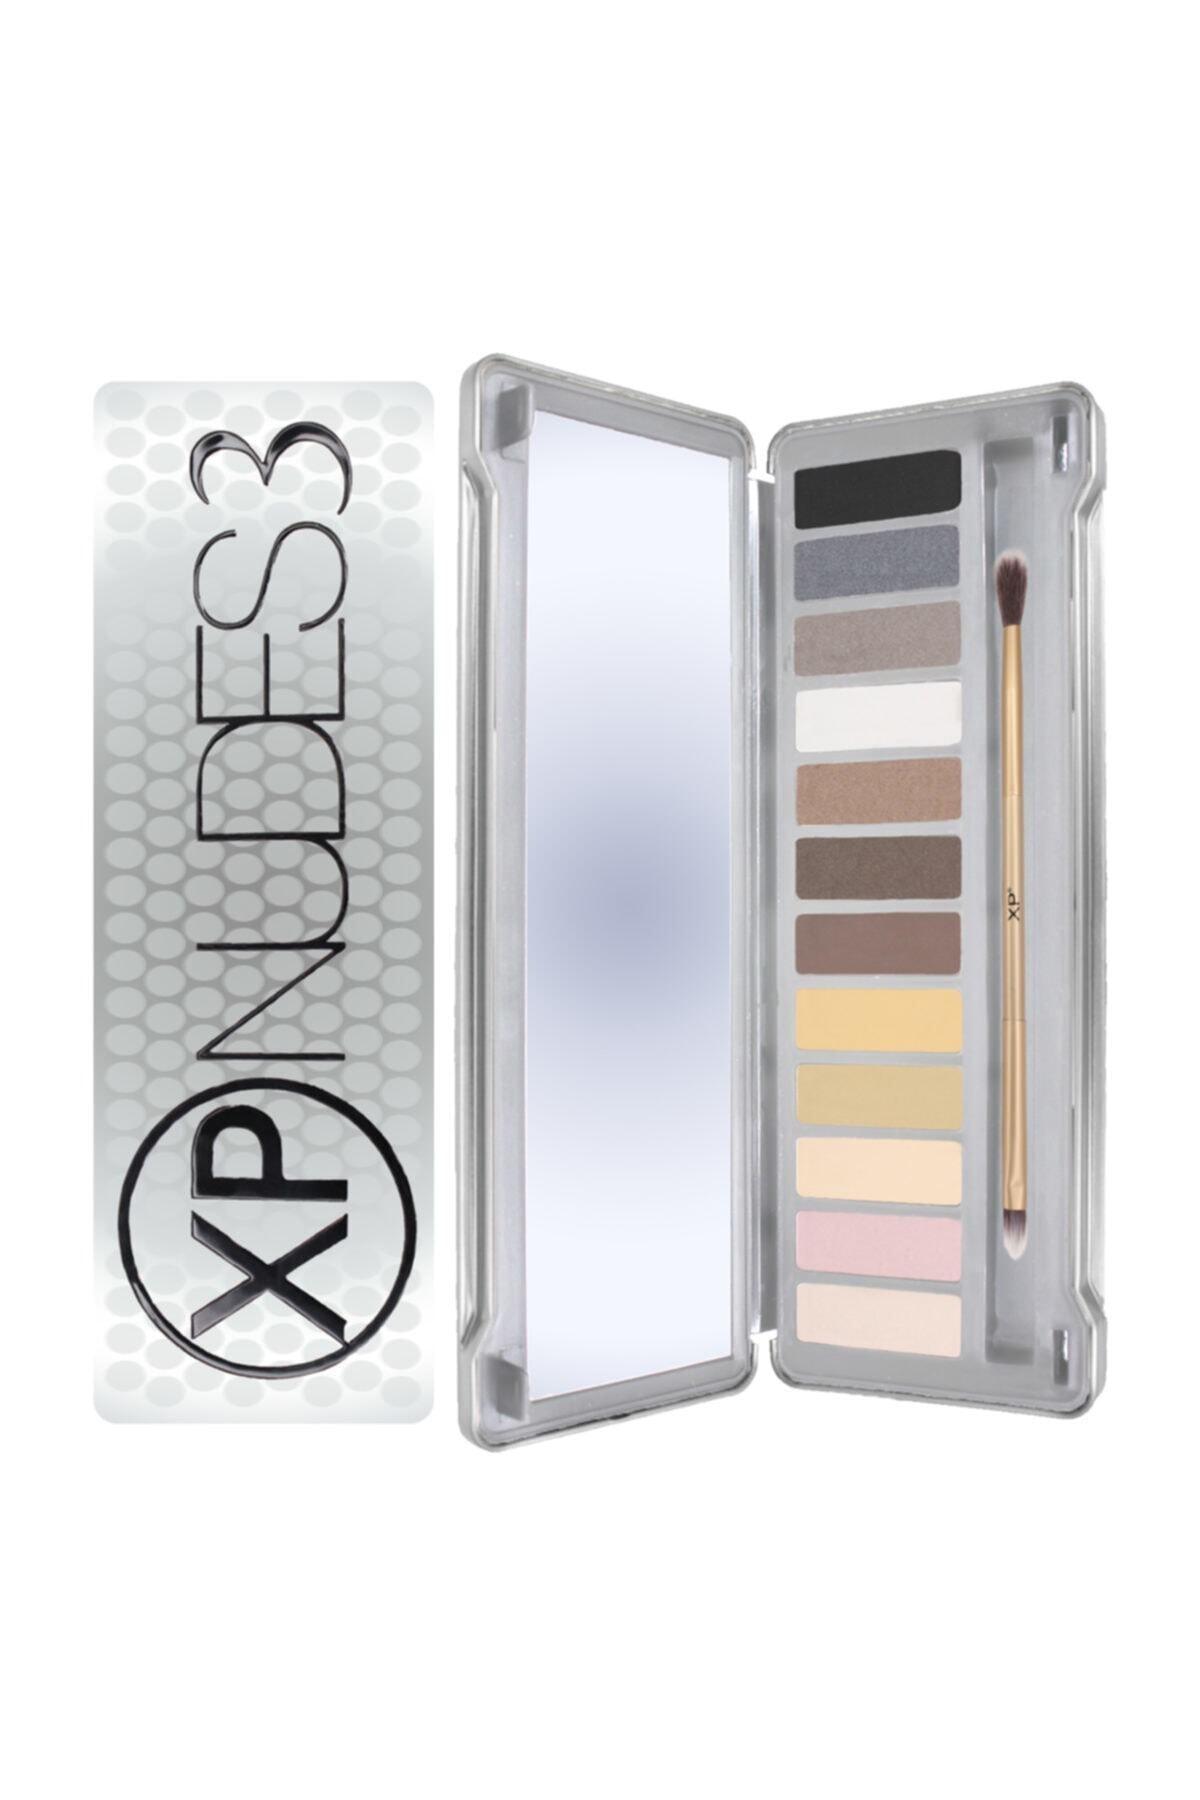 XP Nudes 3 Metal Far Paleti 1